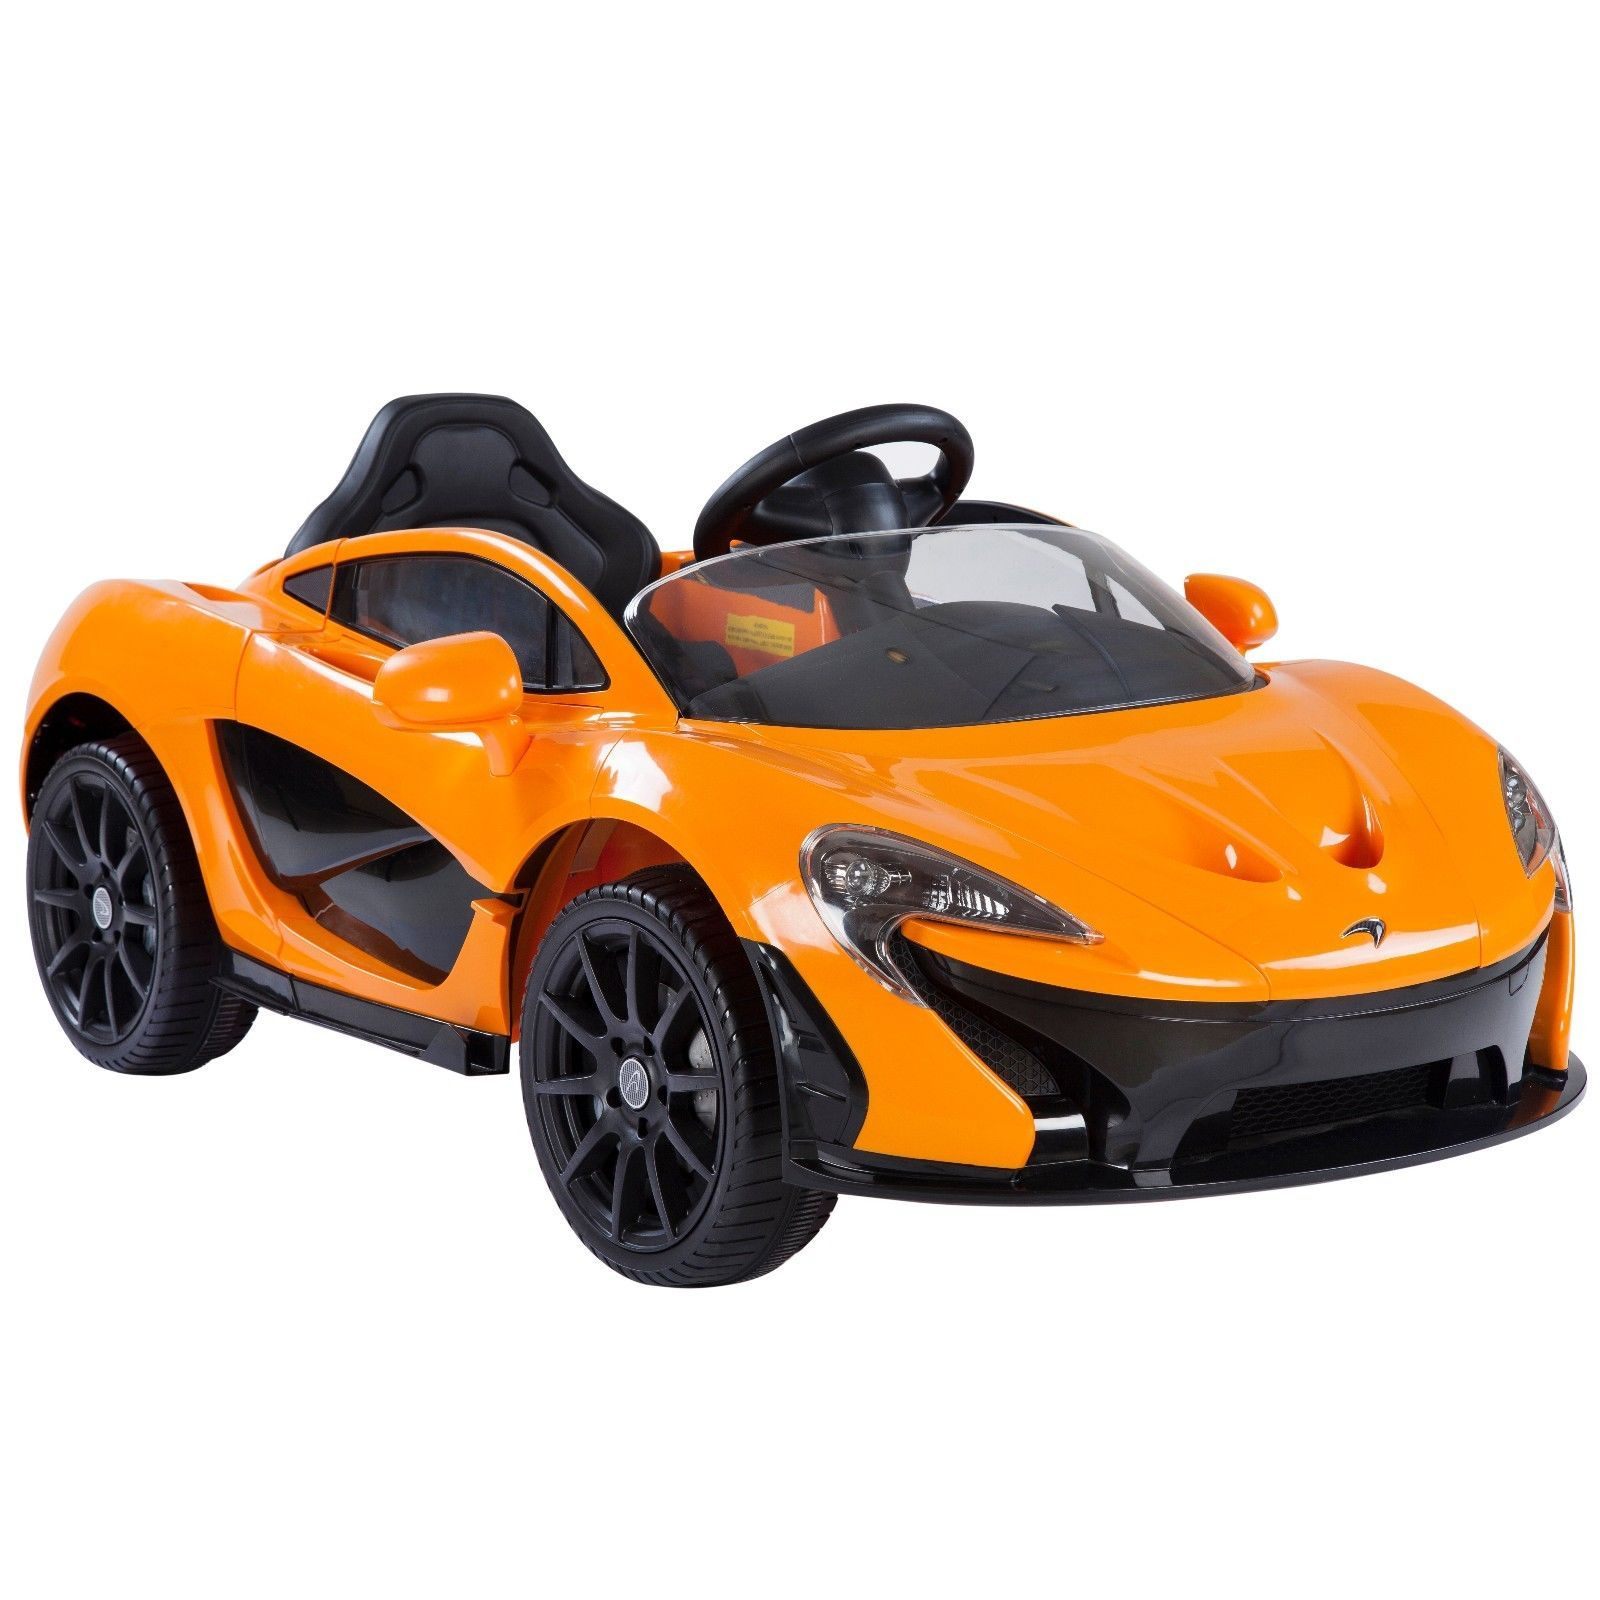 Electric 12V power car McLaren P1 Ride On For Kids With Remote Control LED lights MP3 & USB port engine start sound - Orange